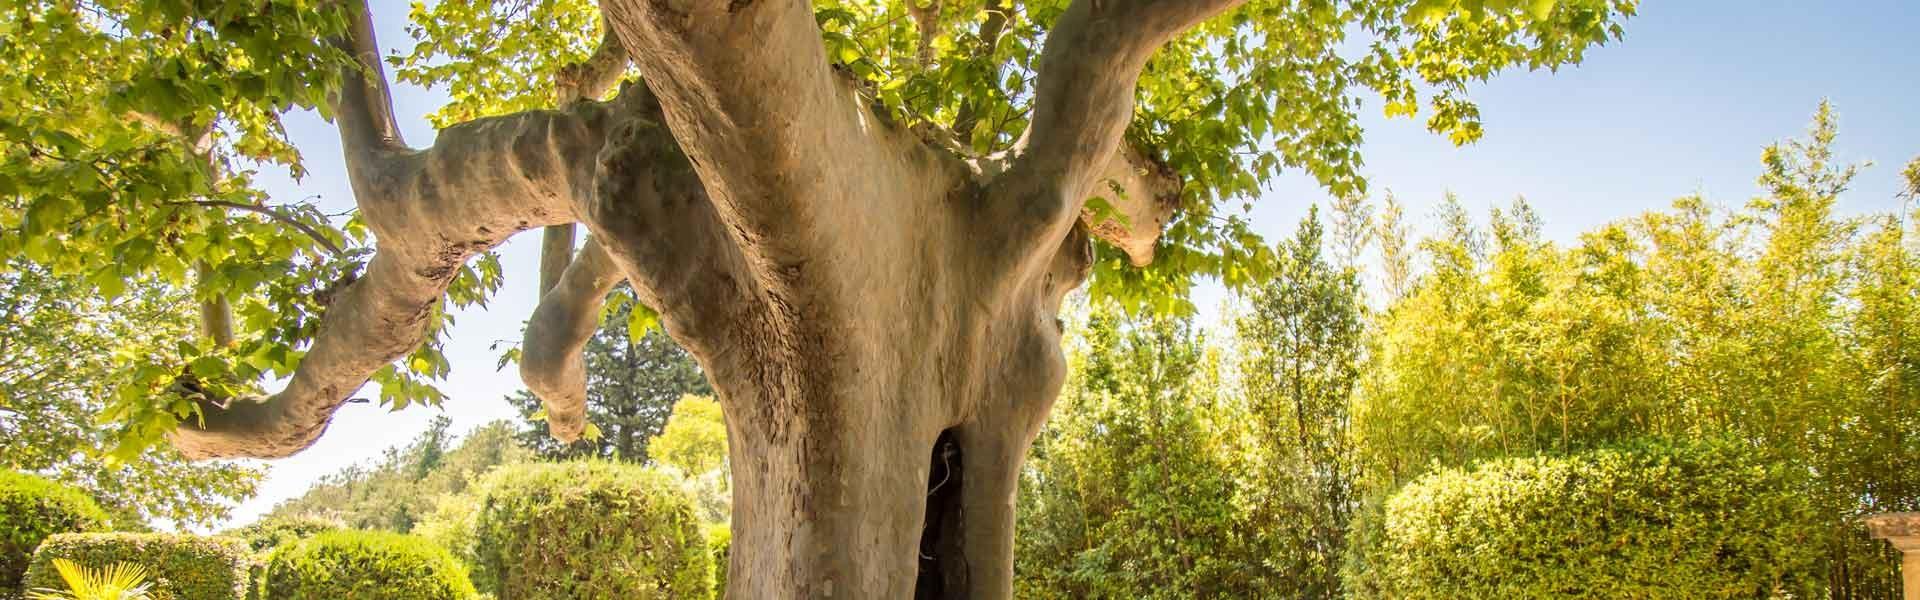 1920x600-ancient-tree